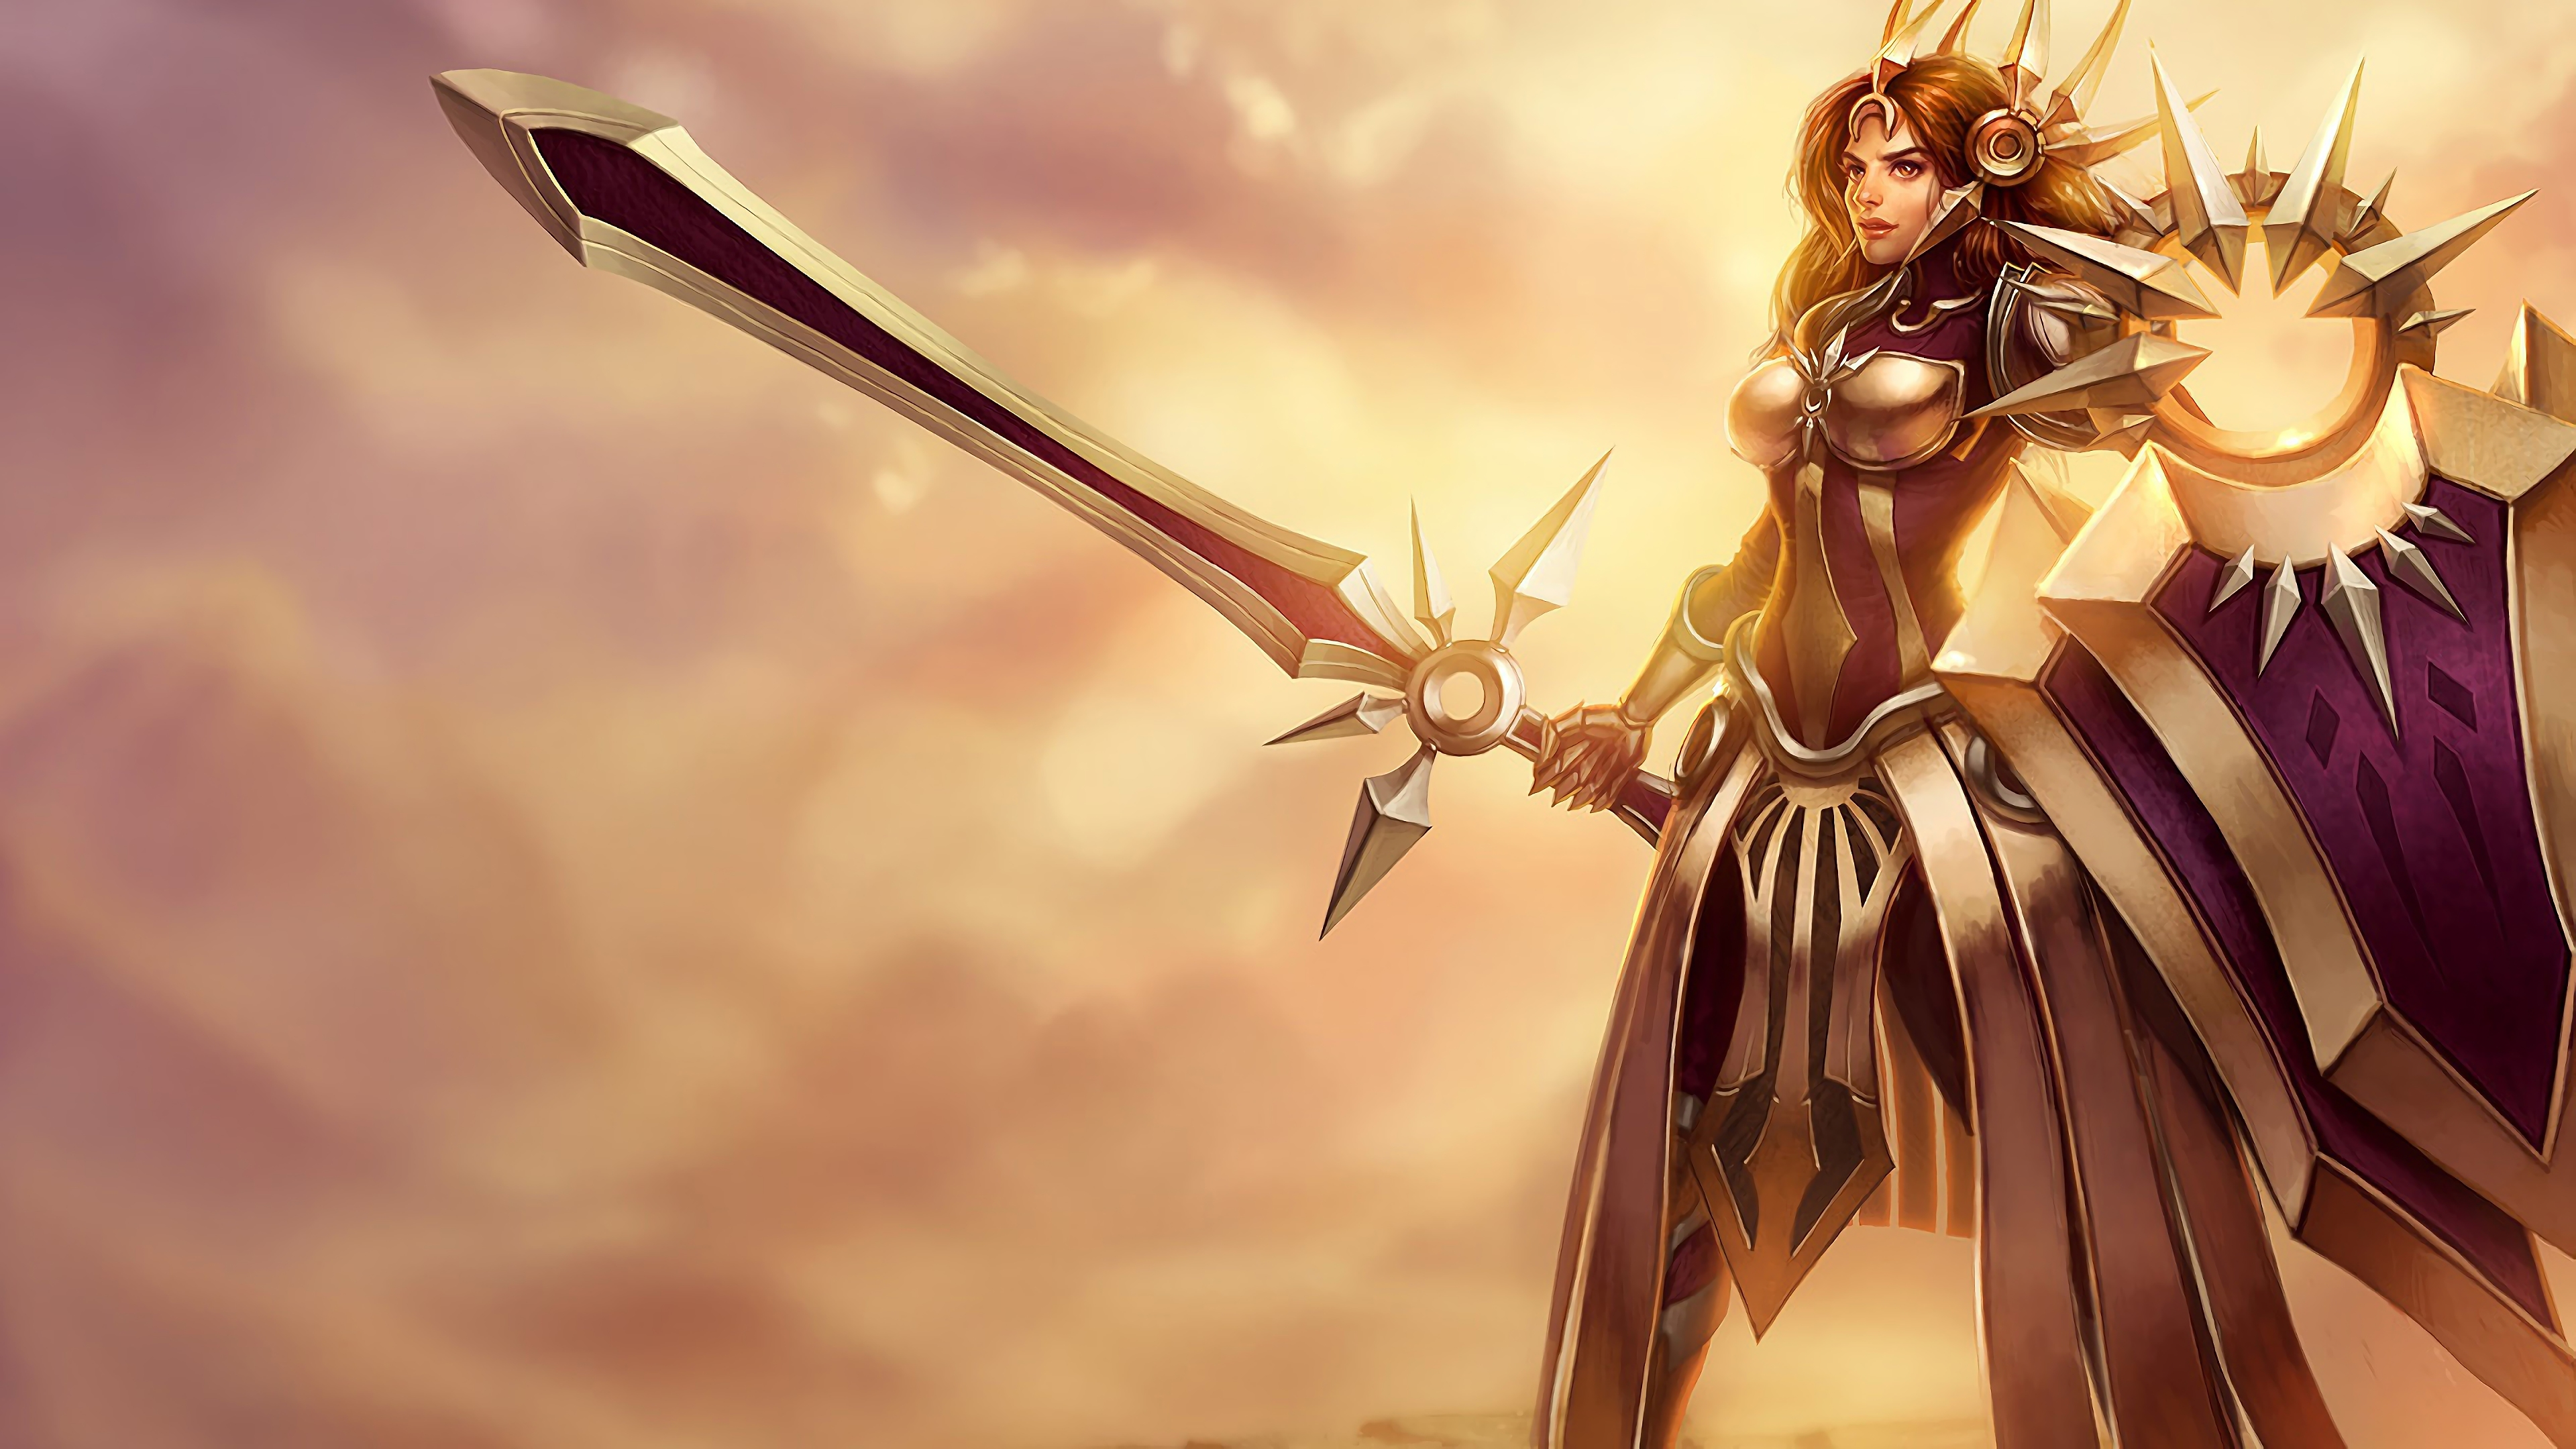 leona lol splash art league of legends 1574098178 - Leona LoL Splash Art League of Legends - Leona, league of legends